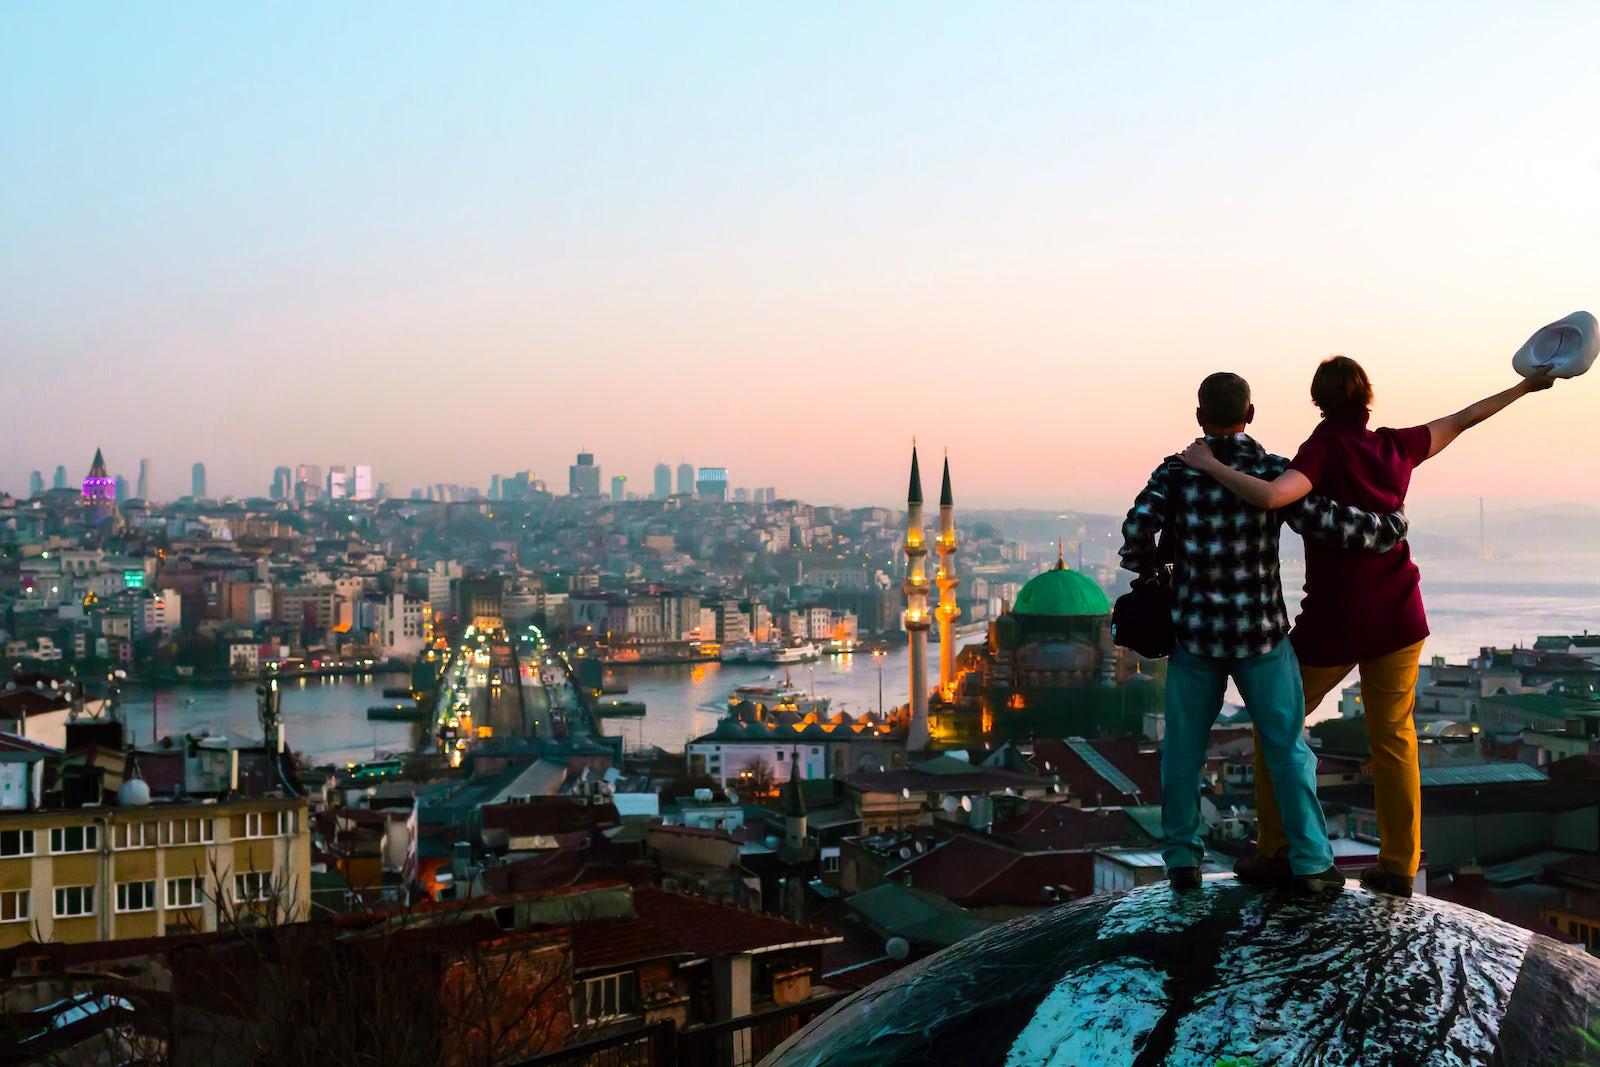 CoverPicture © Credits to iStock/AlexBrylov